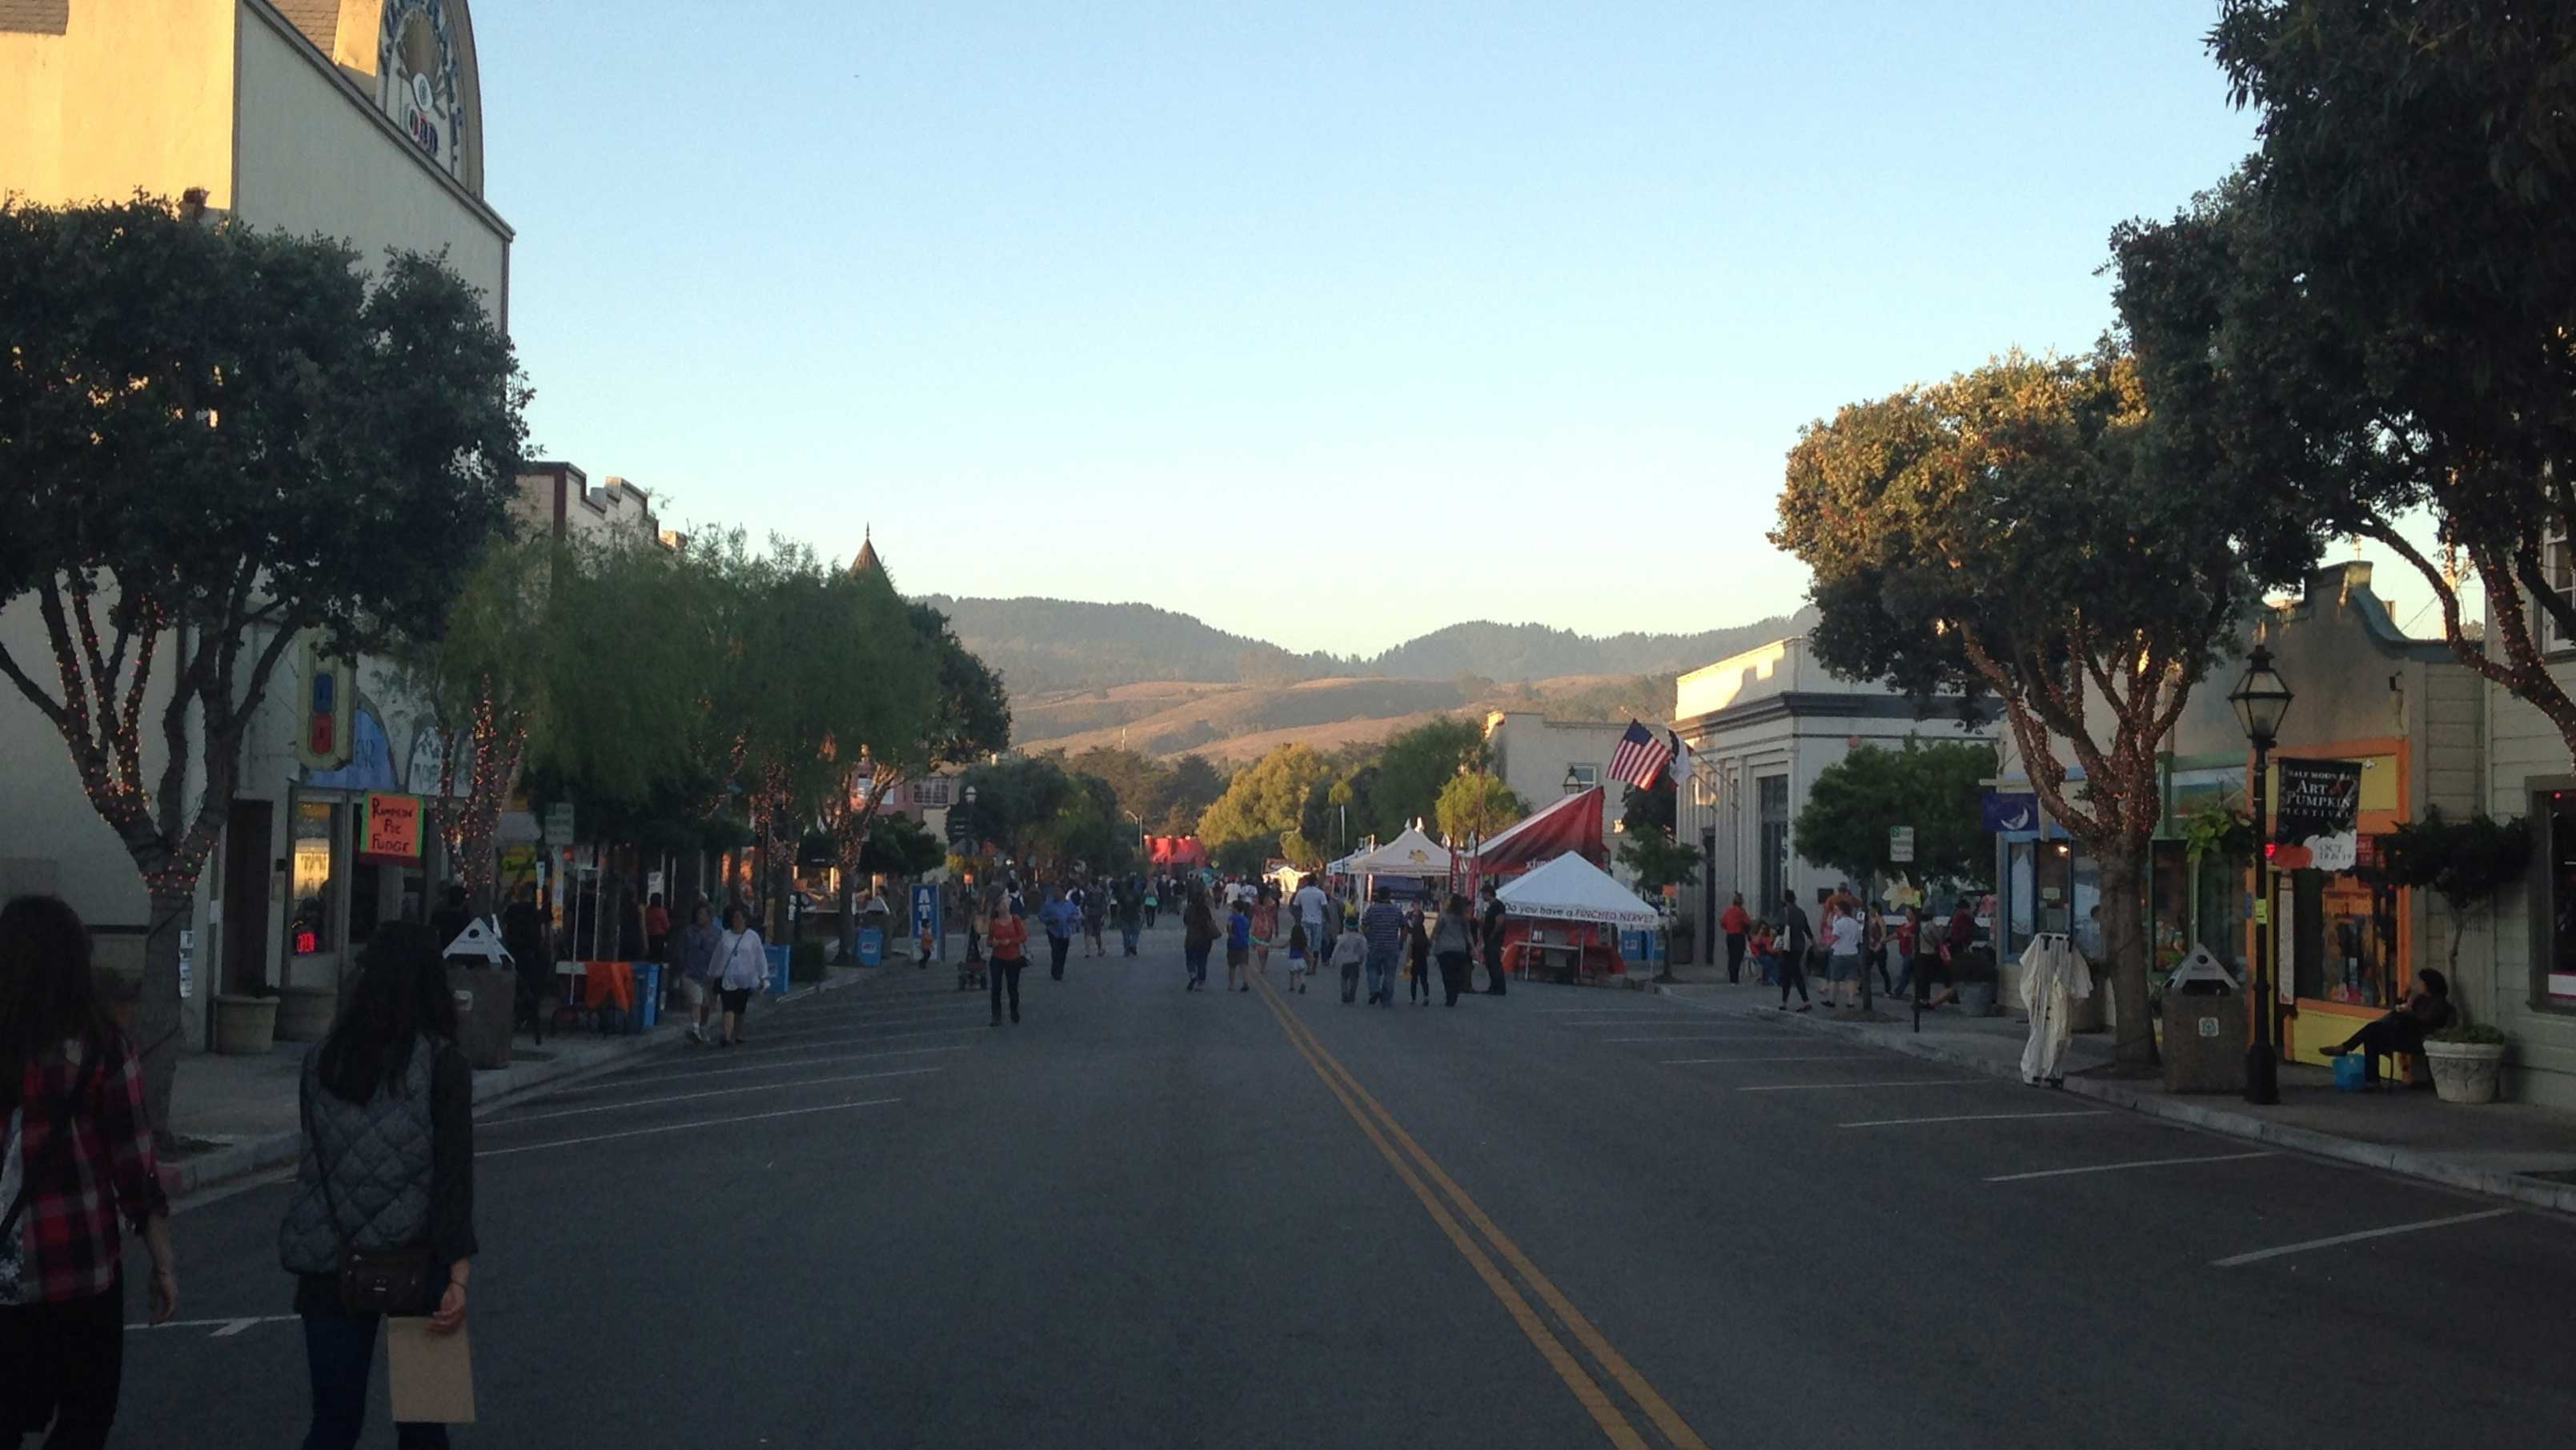 The sun sets on Half Moon Bay's Main Street at the 44th annual Art and Pumpkin Festival on Saturday October 18, 2014. (Miranda Shepherd/Peninsula Press)